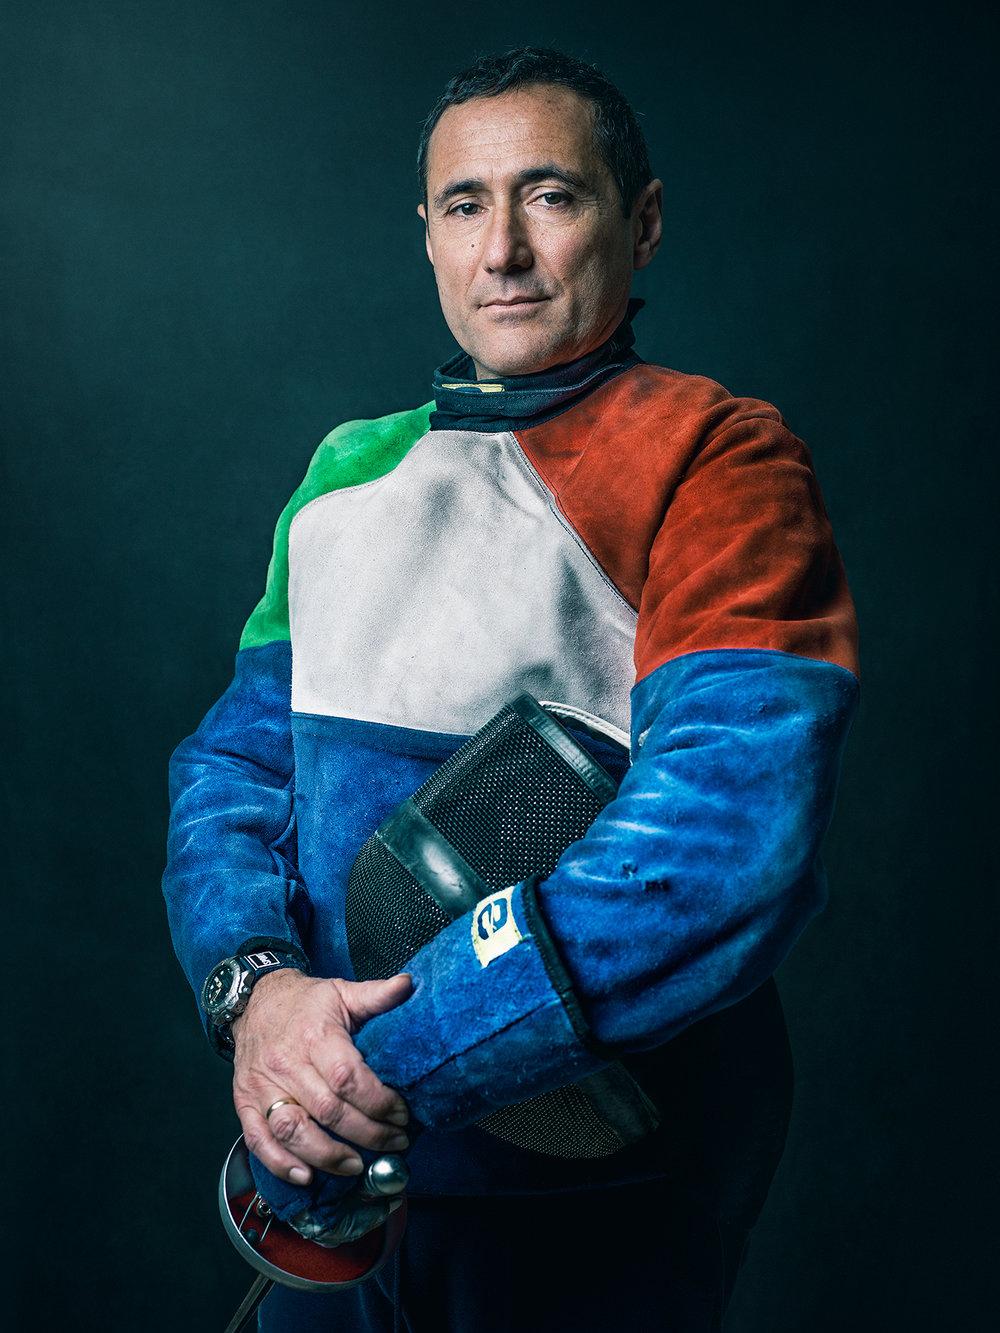 Oscar-arribas-esgrima-maestro-fencing-master-fencer-fechten-scherma-escrime-portrait-fotografo-retrato-photographer012.jpg